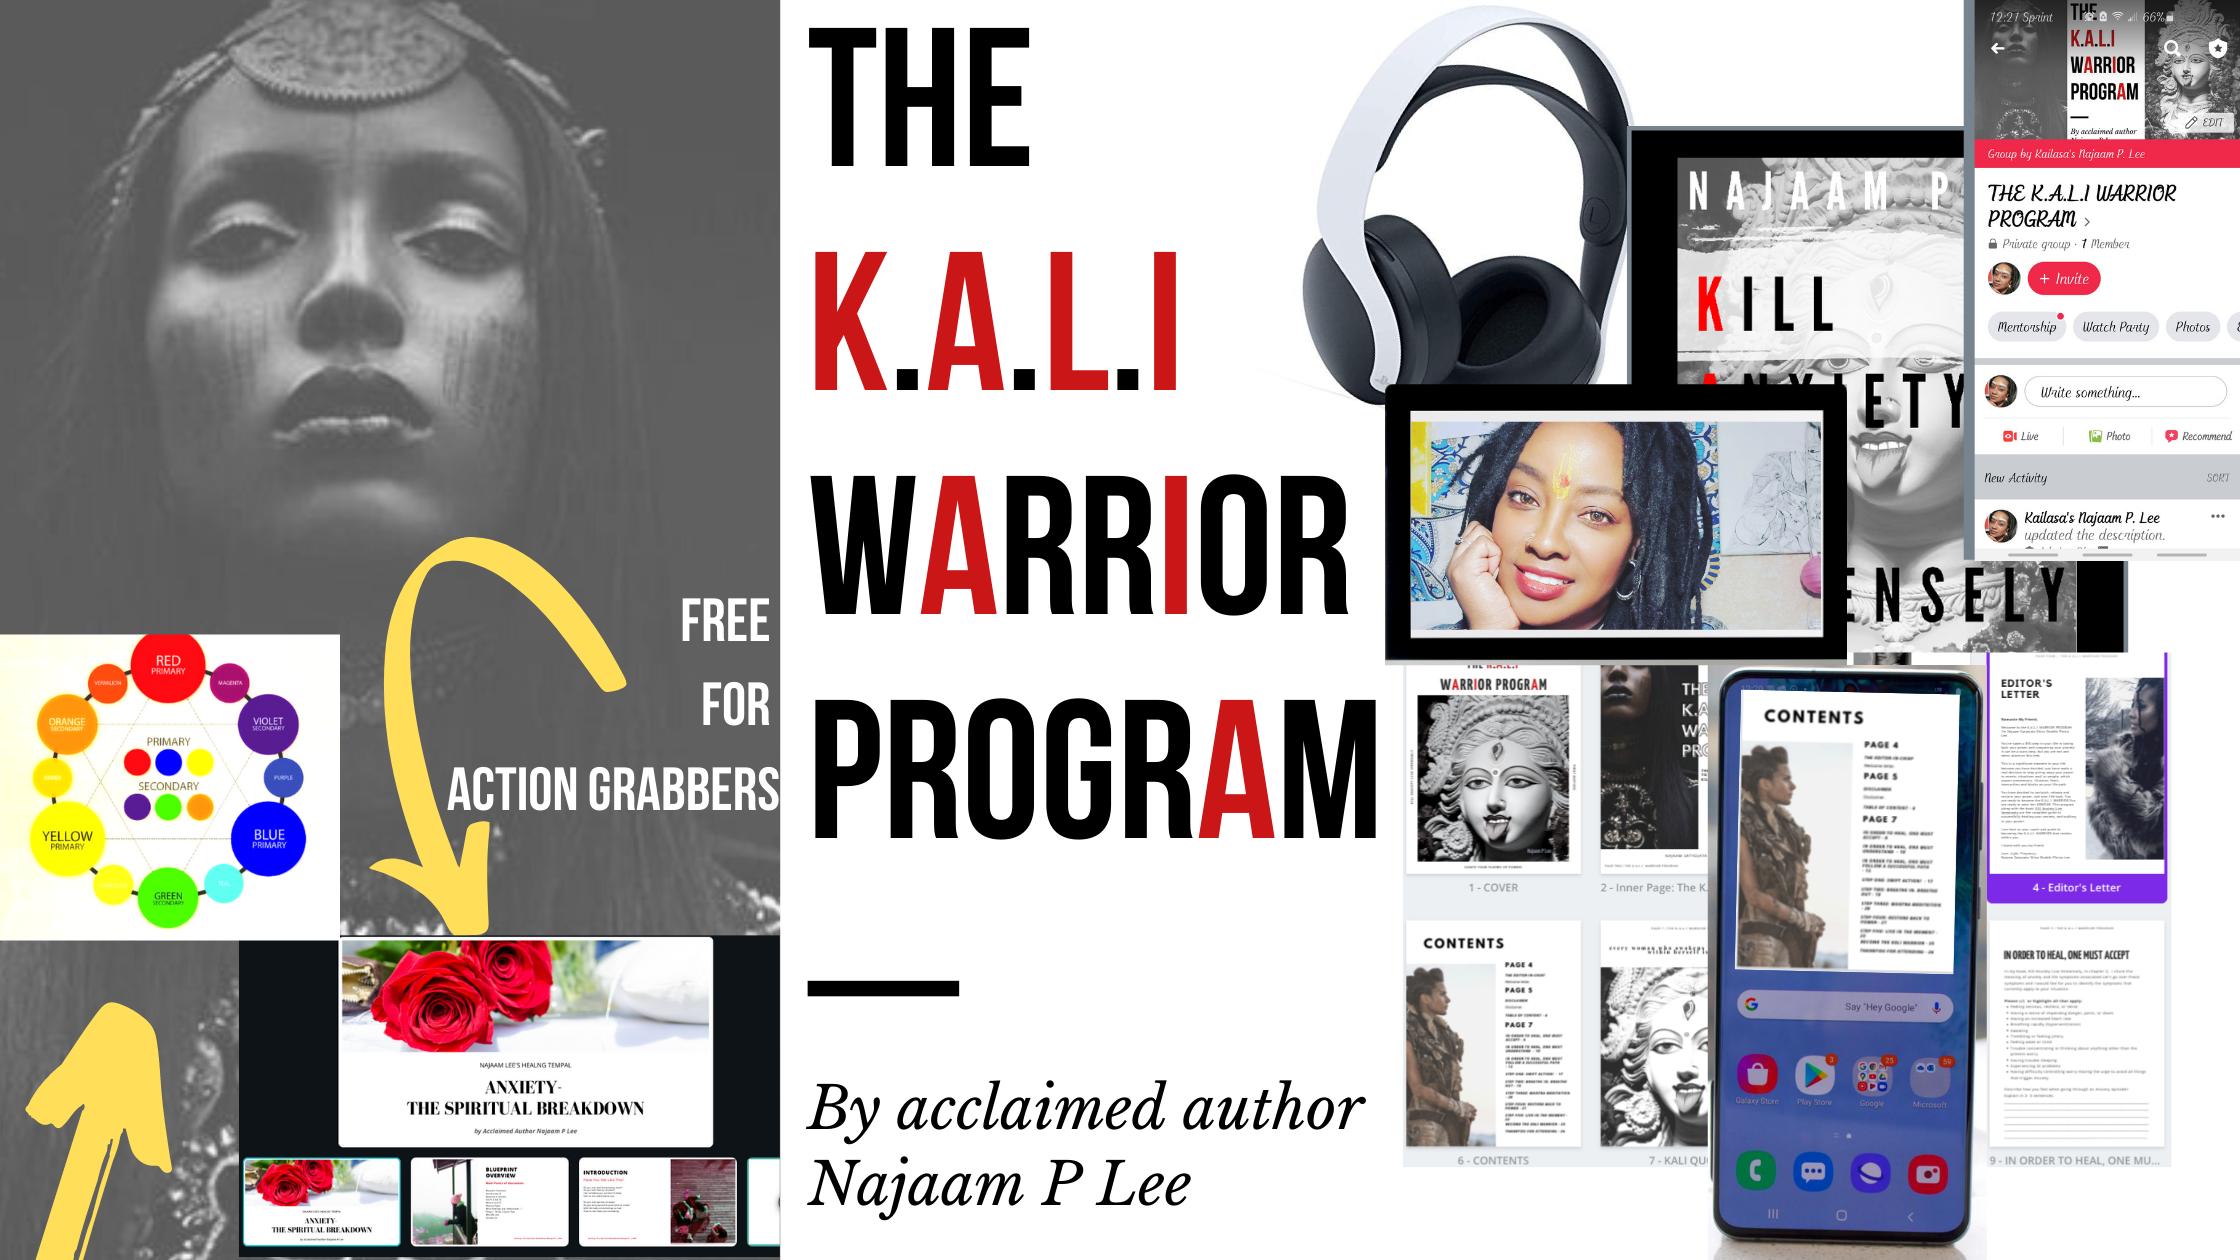 THE K.A.L.I WARRIOR PROGRAM